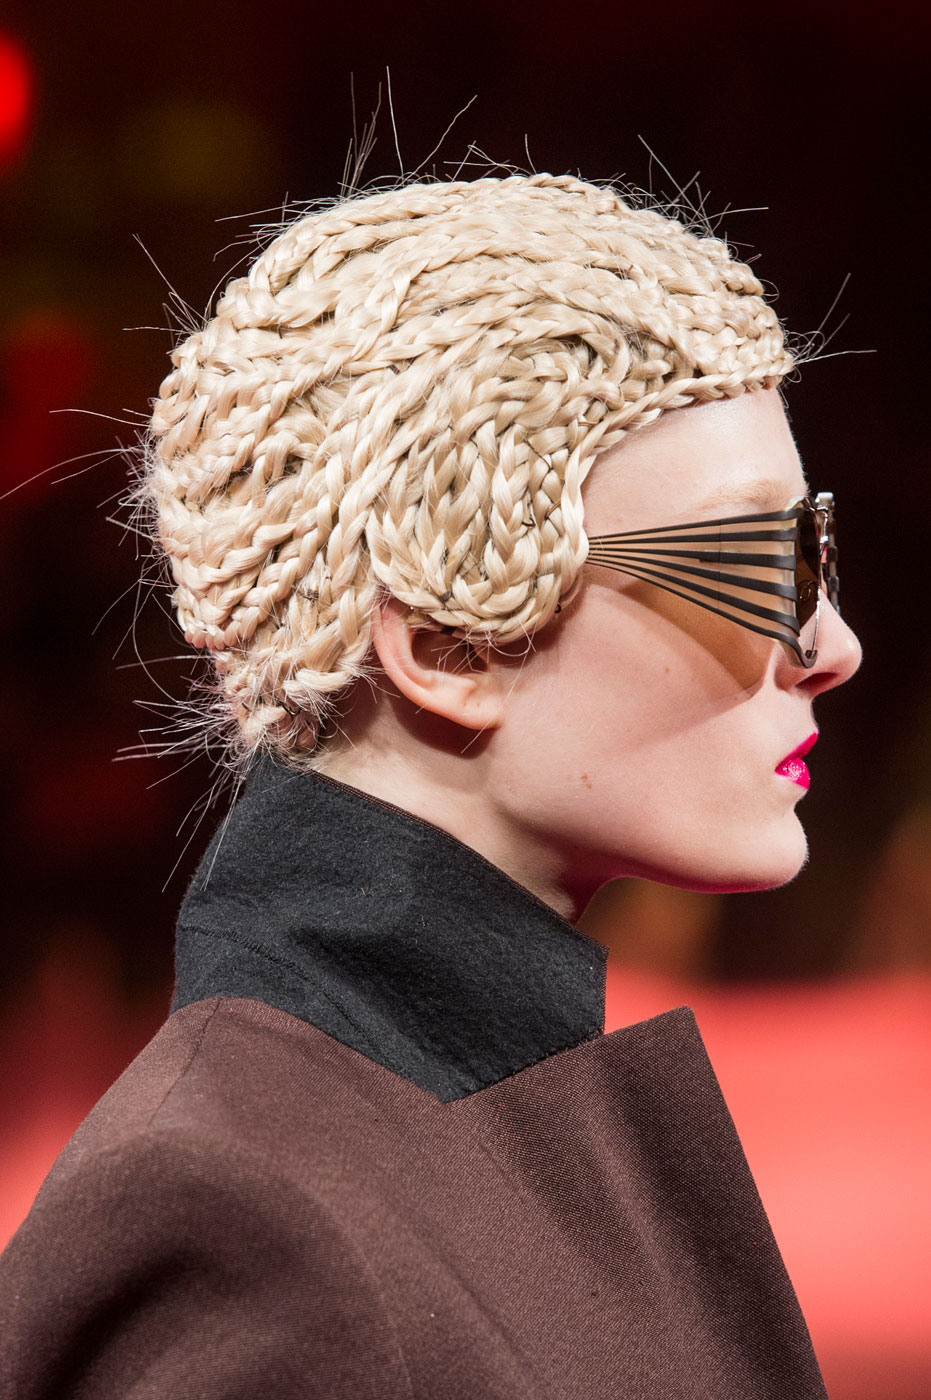 Schiaparelli-fashion-runway-show-close-ups-haute-couture-paris-spring-summer-2015-the-impression-40